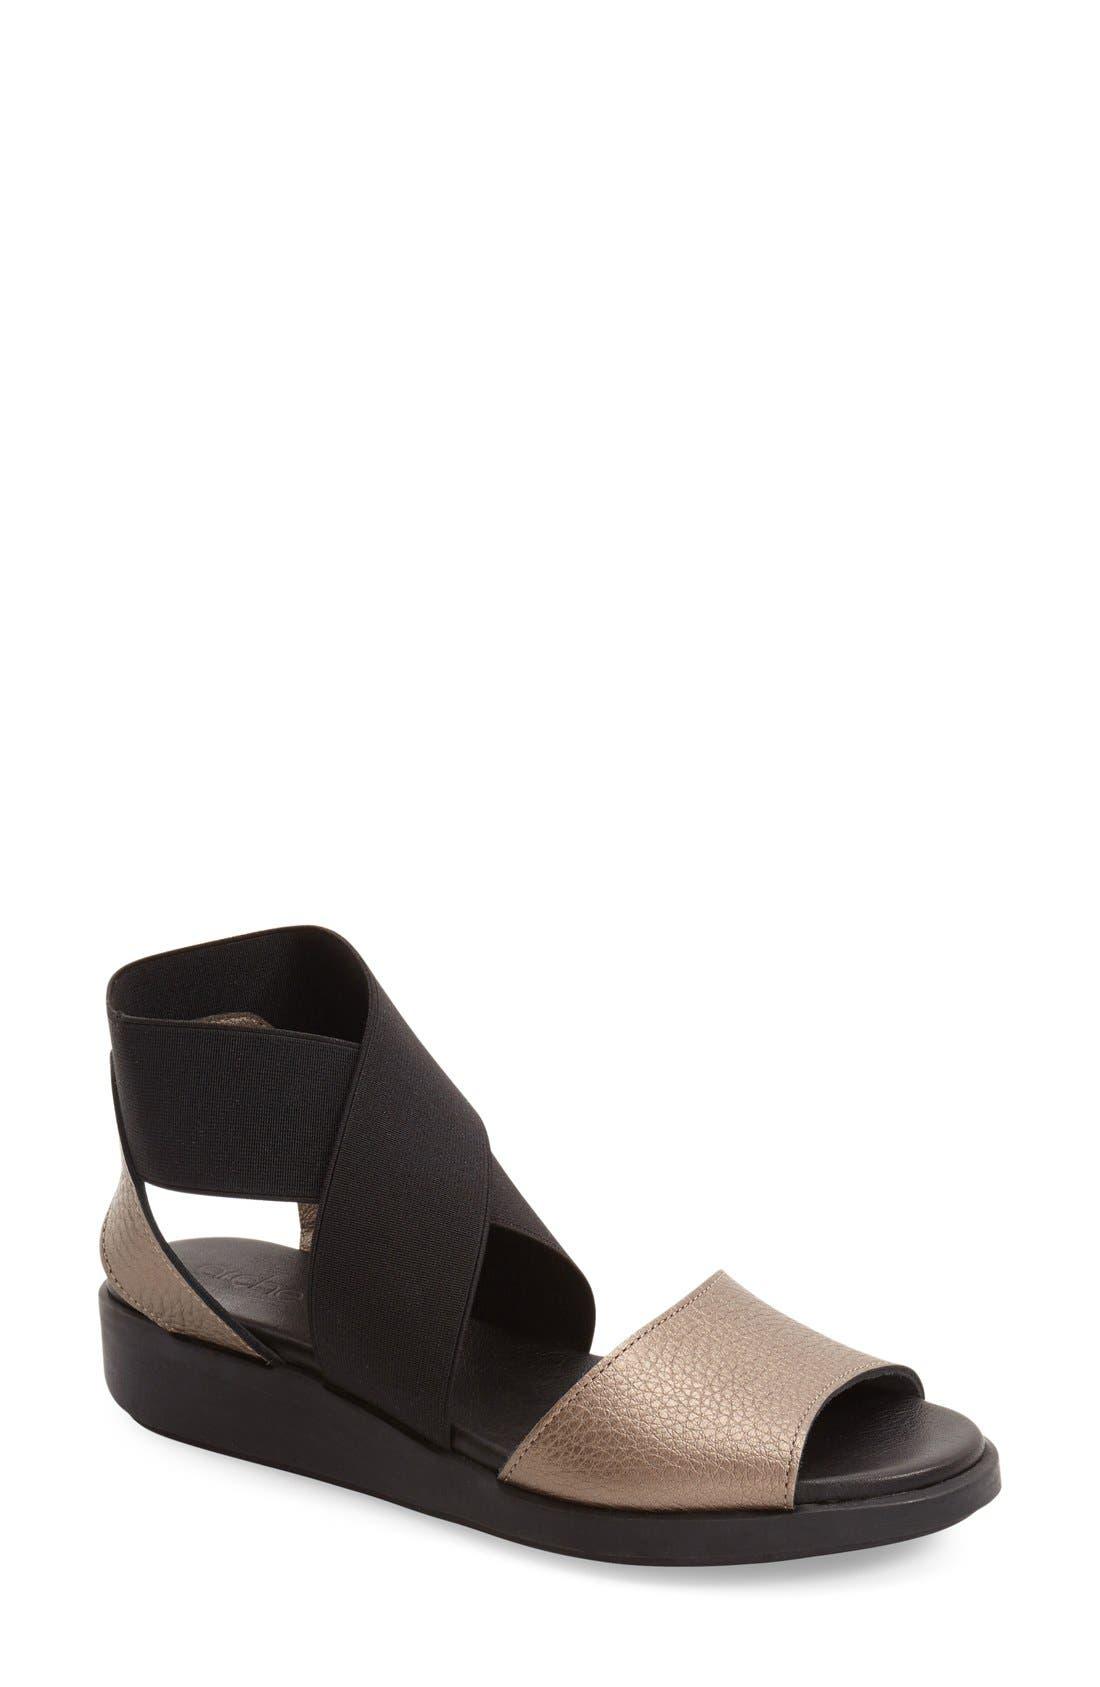 ARCHE 'Senzu' Wedge Sandal